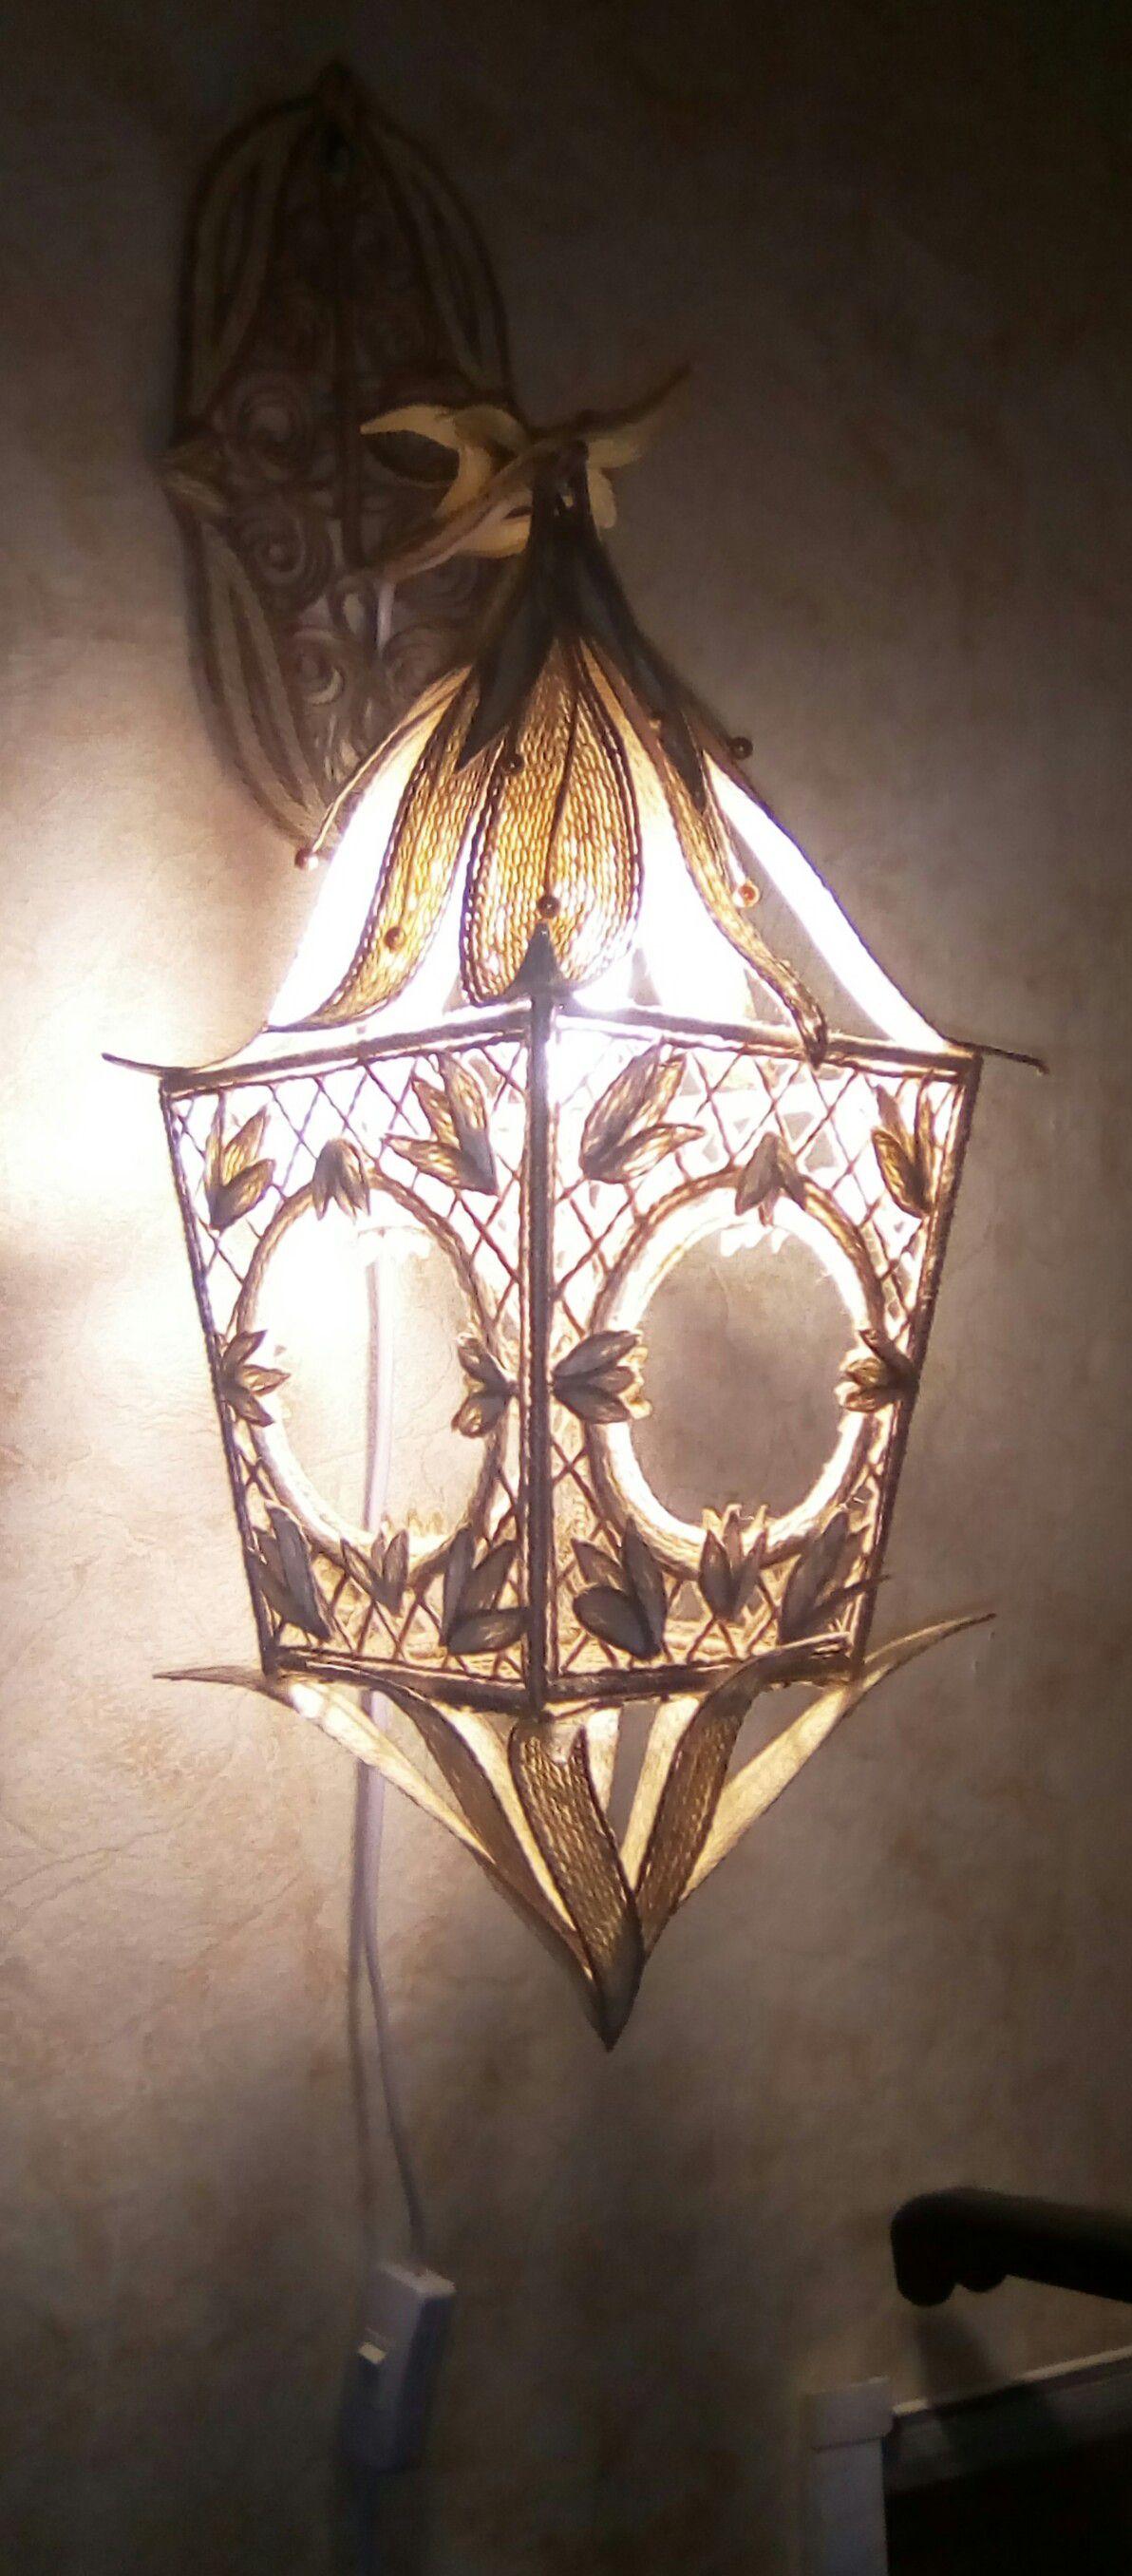 освещение фонарь ночник шпагат ручнаяработа